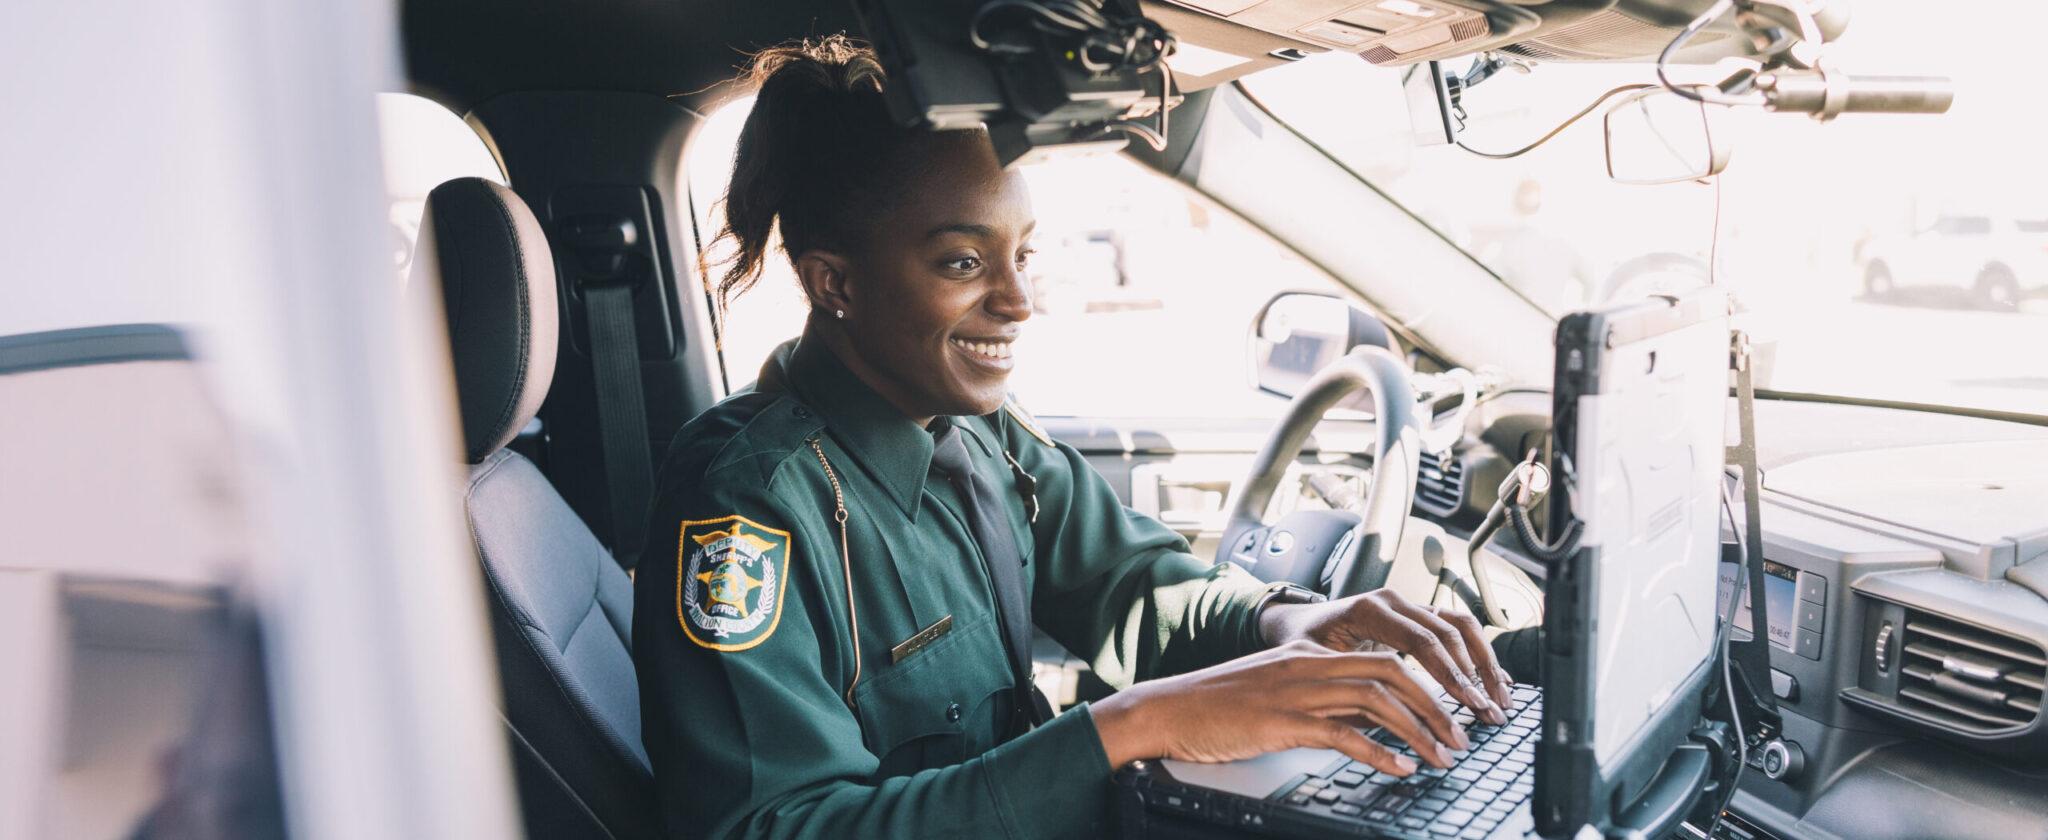 Black female officer typing on laptop inside law enforcement vehicle